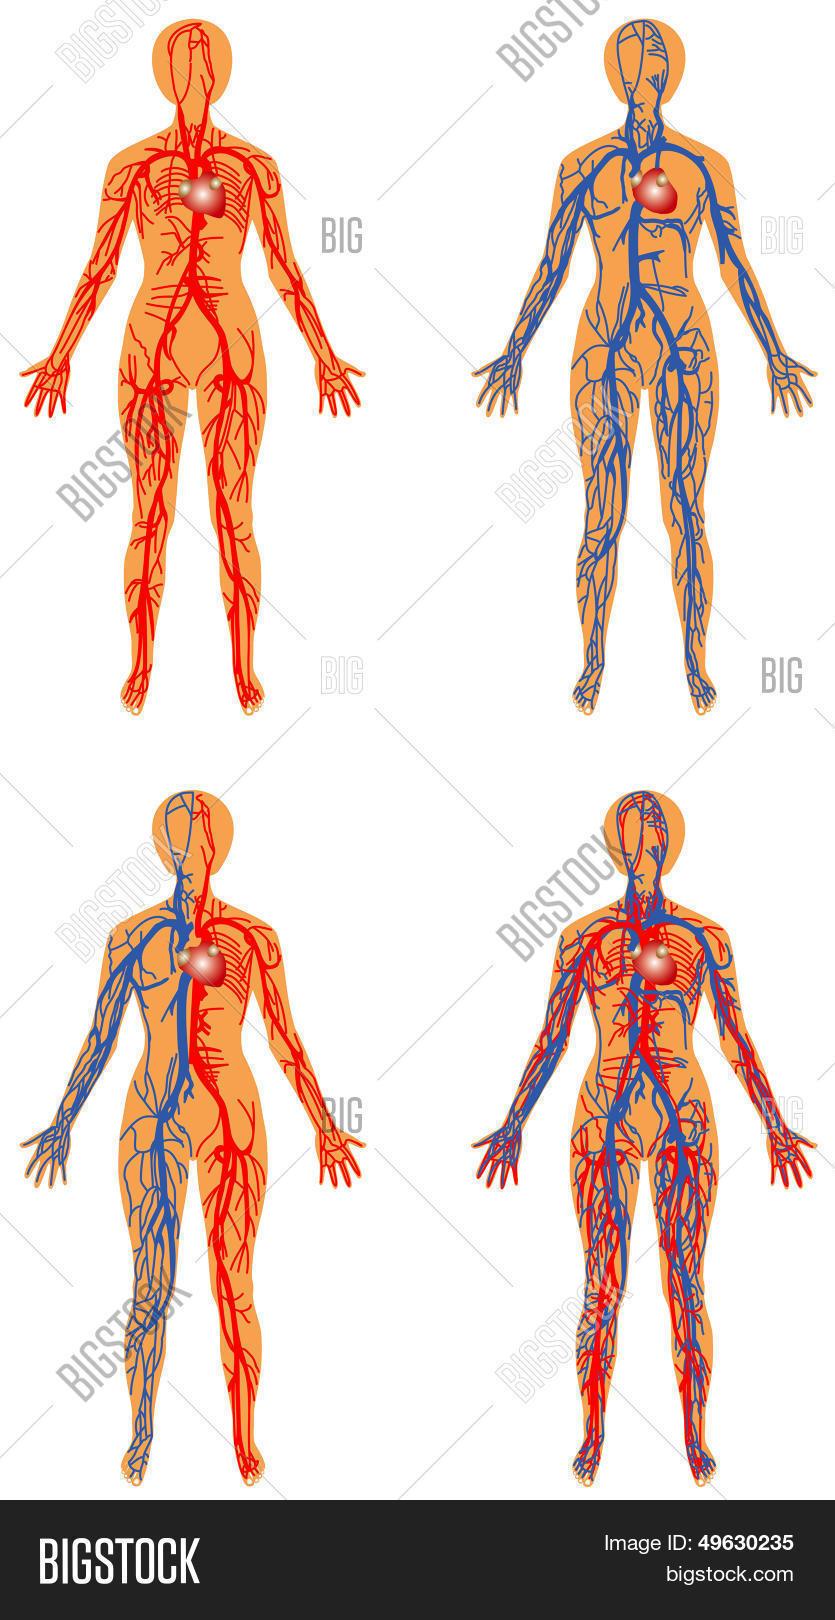 Human Vascular System Vector Photo Free Trial Bigstock